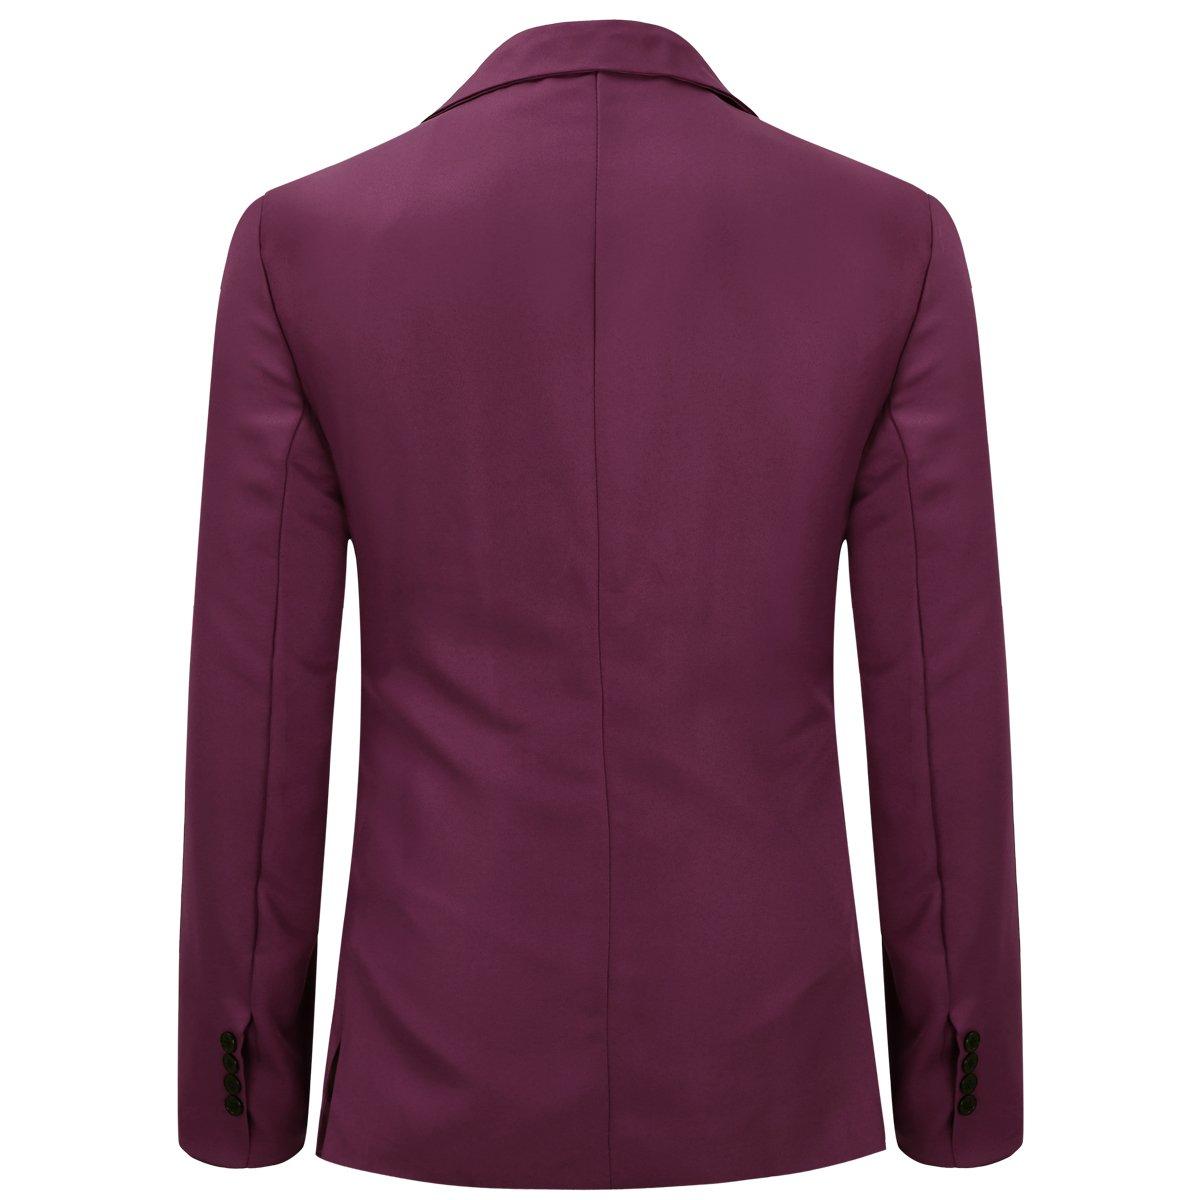 0f76da7e6d0 YUNCLOS Men s Slim Fit Casual One Button Notched Lapel Blazer Jacket at  Amazon Men s Clothing store